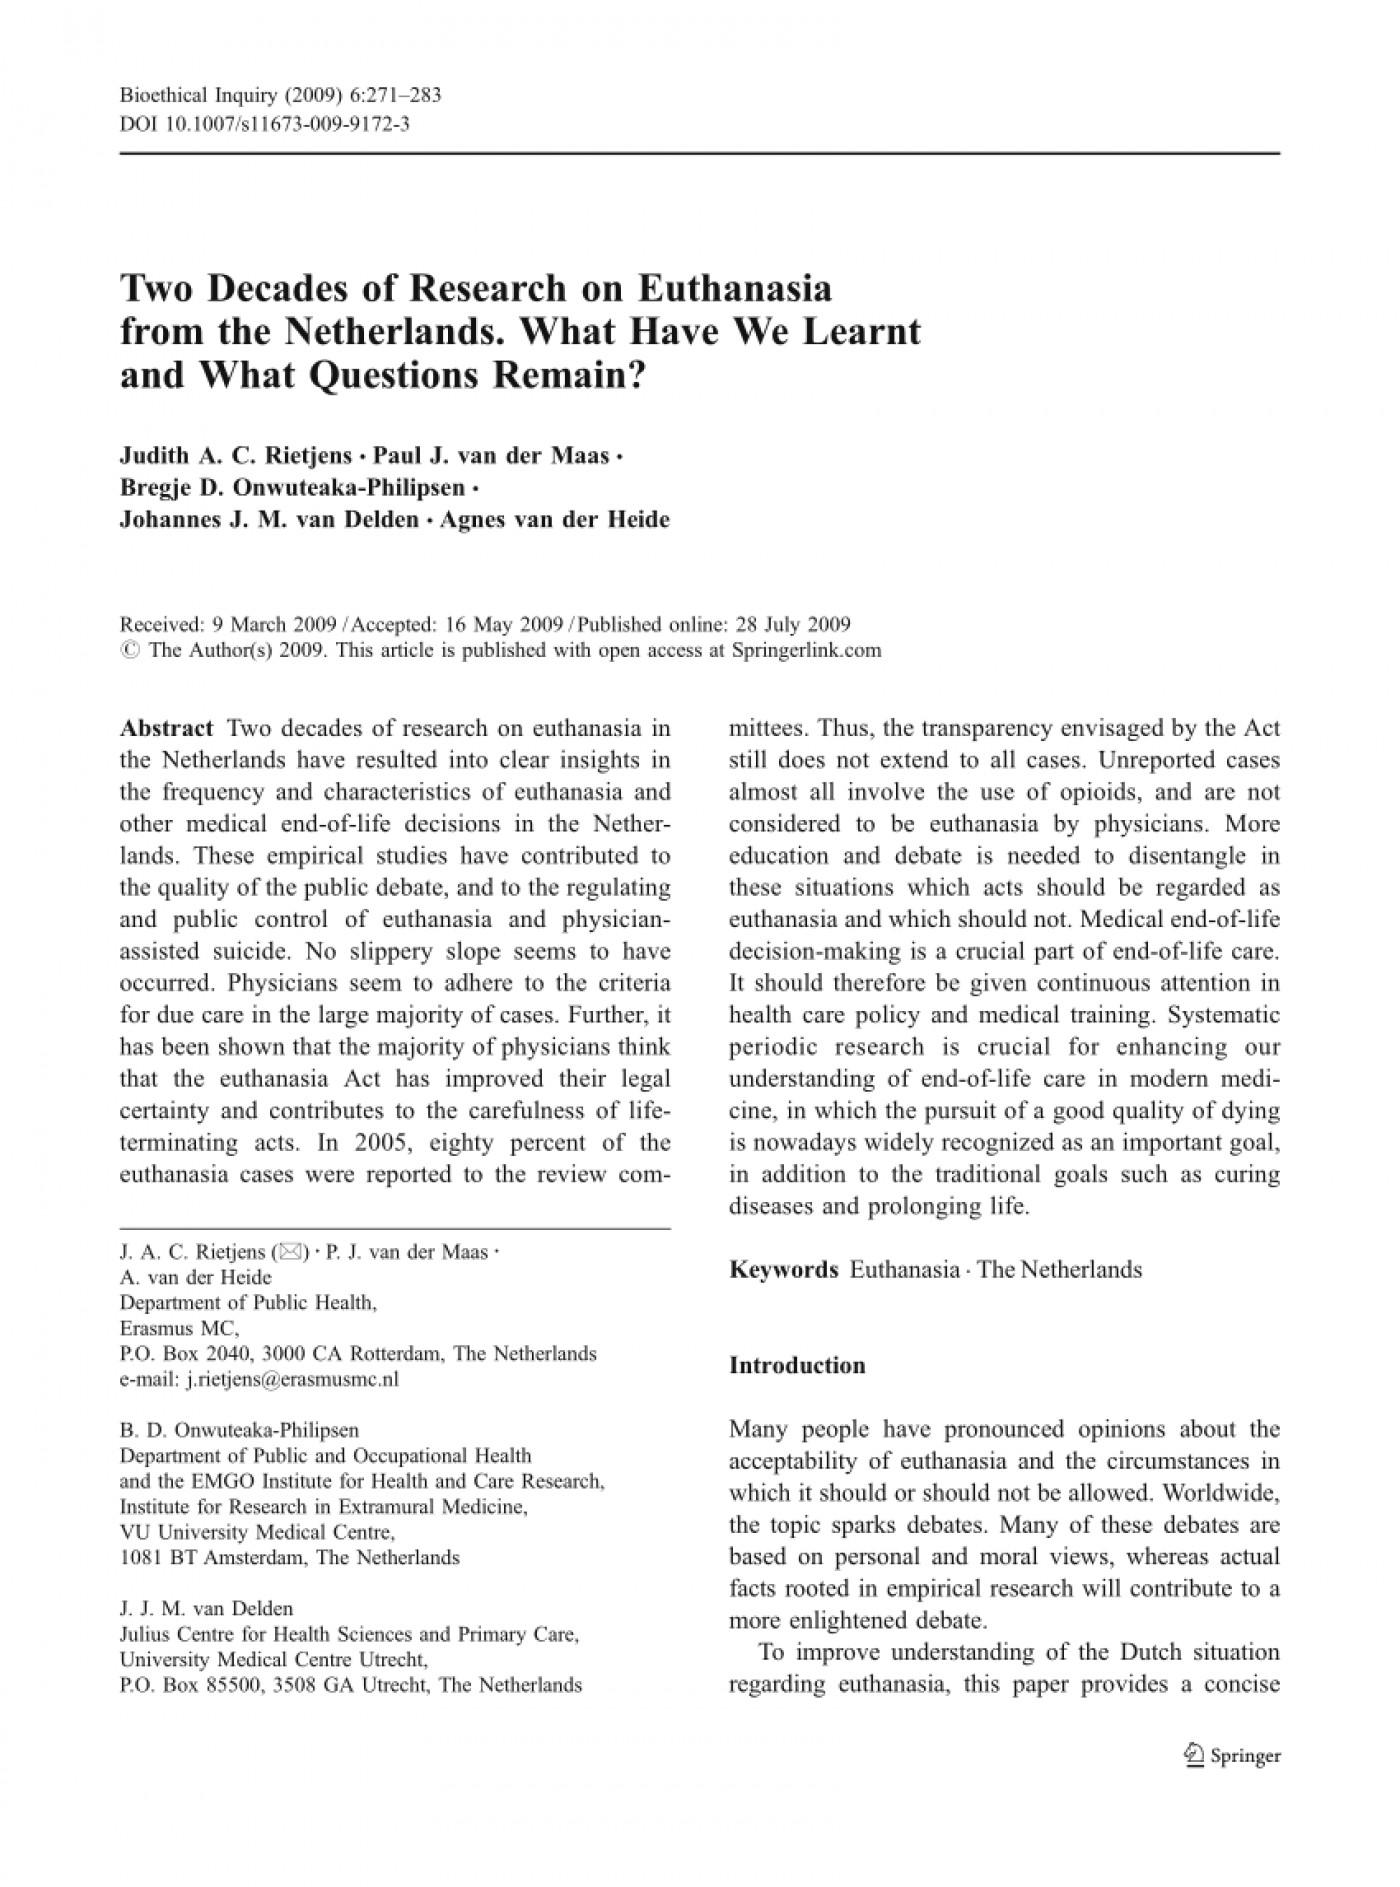 003 Euthanasia Argumentative Essay Example Stirring Pdf Introduction Outline 1400